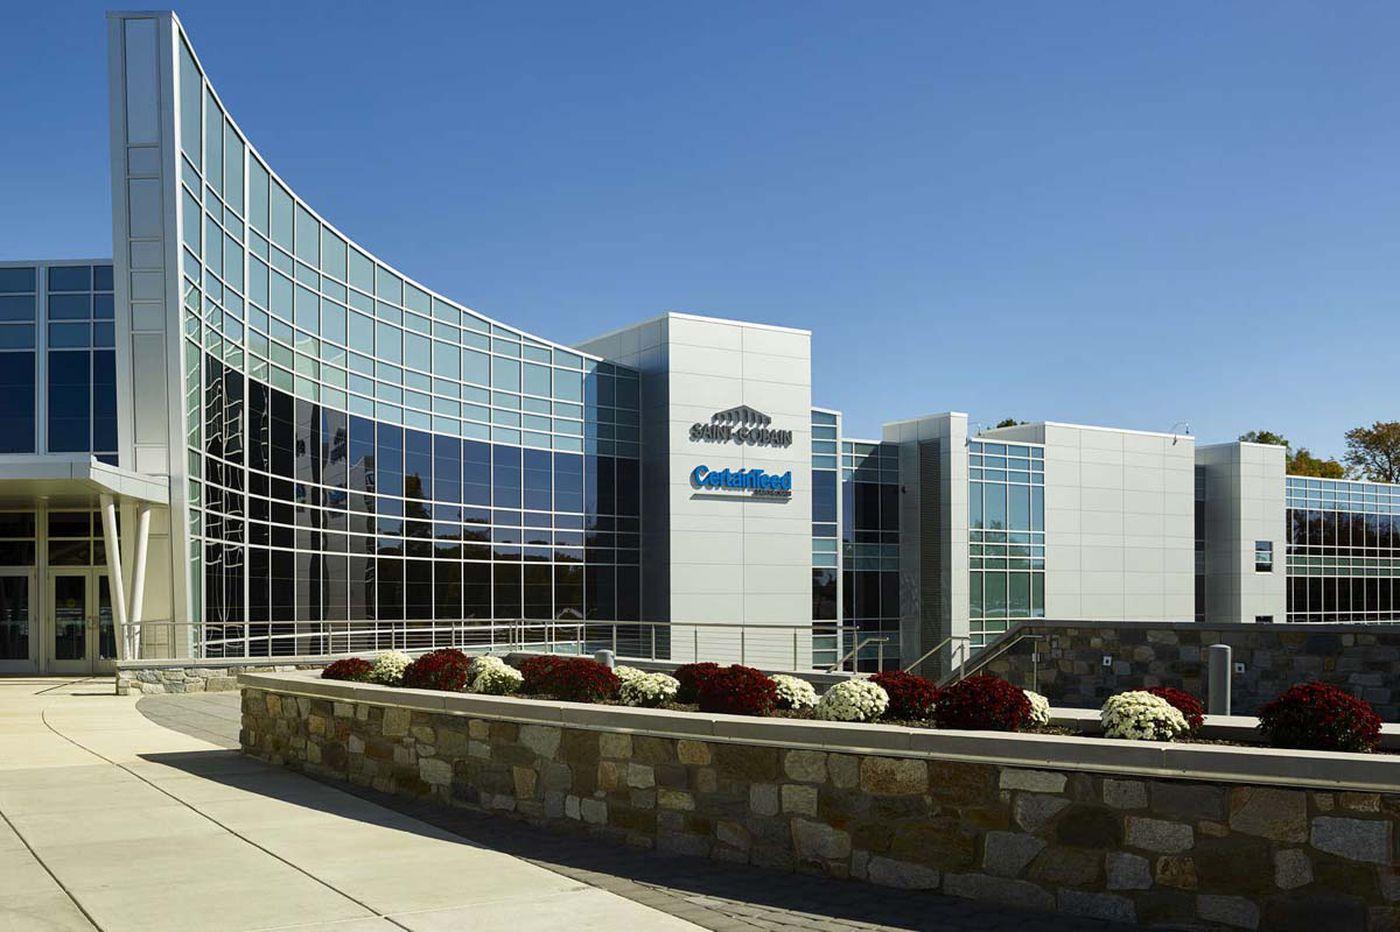 Saint-Gobain, Instem buy rivals as Philly-based European firms seek U.S. customers